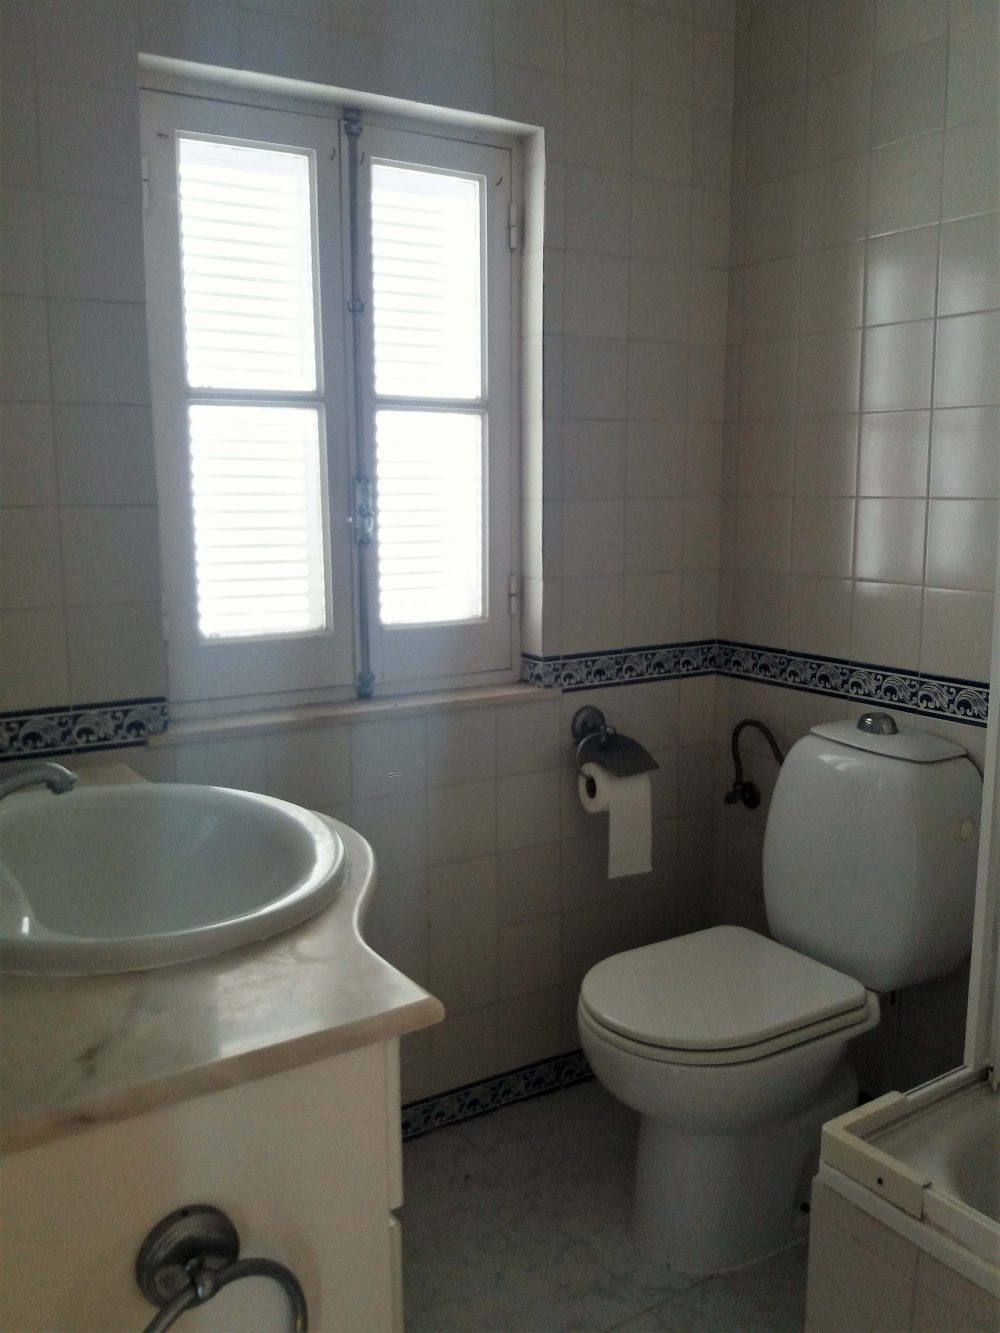 7-Bathroom-suite house 1.